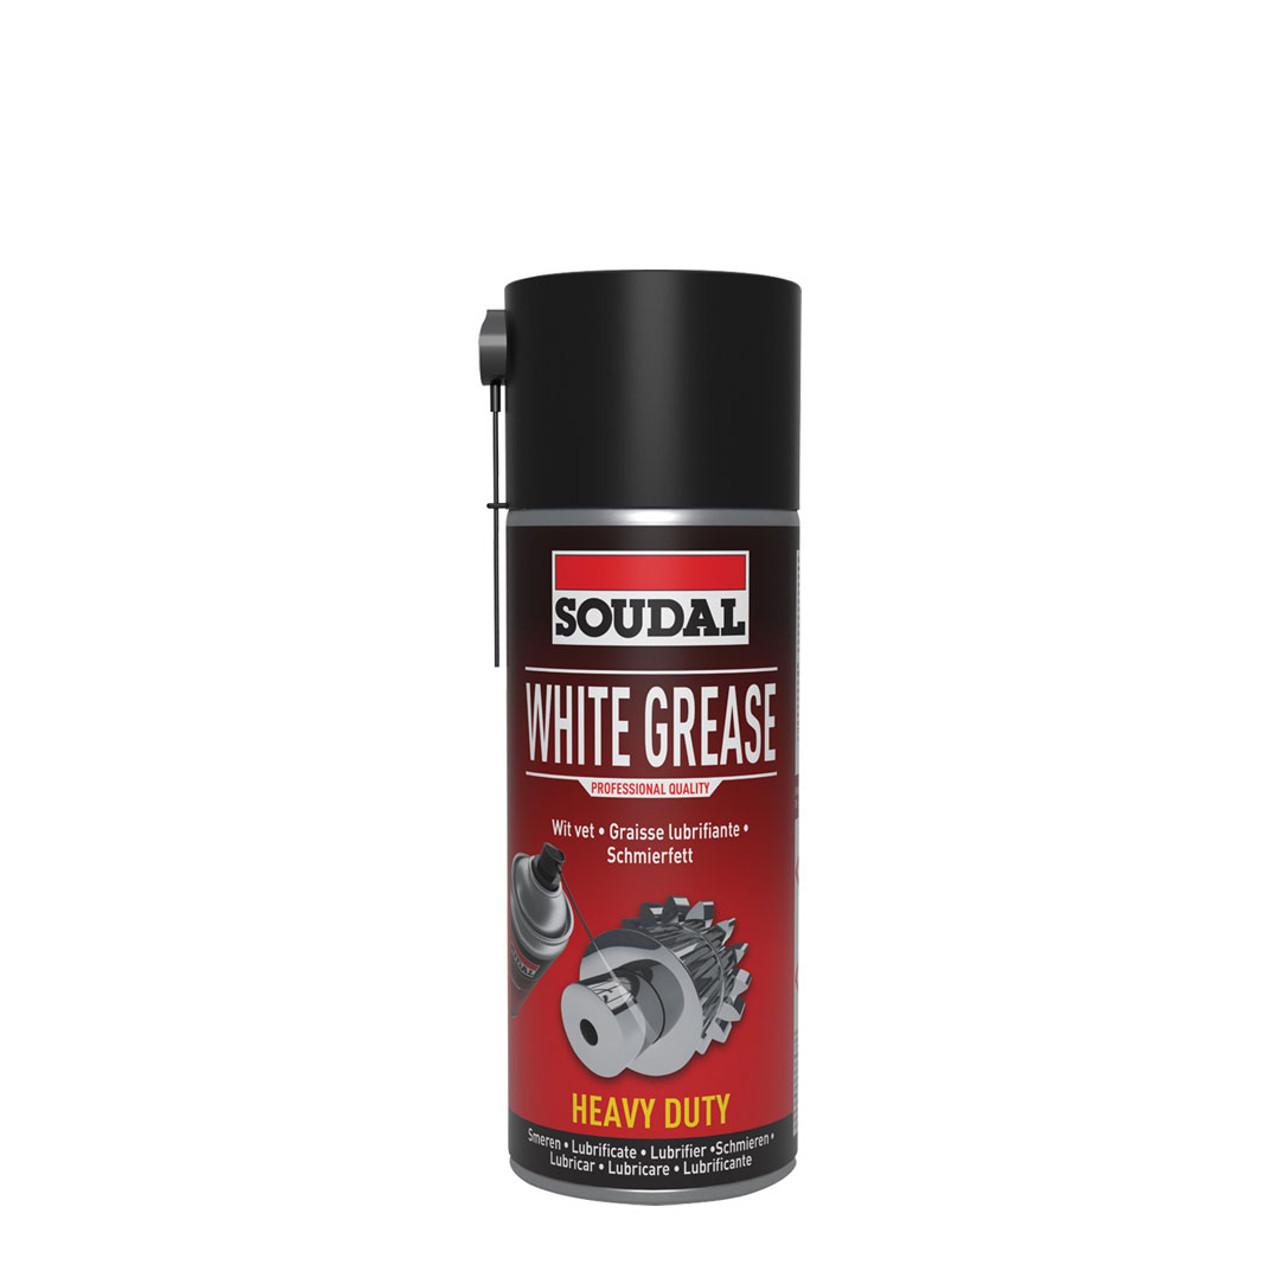 Soudal Spray White Grease 400ml